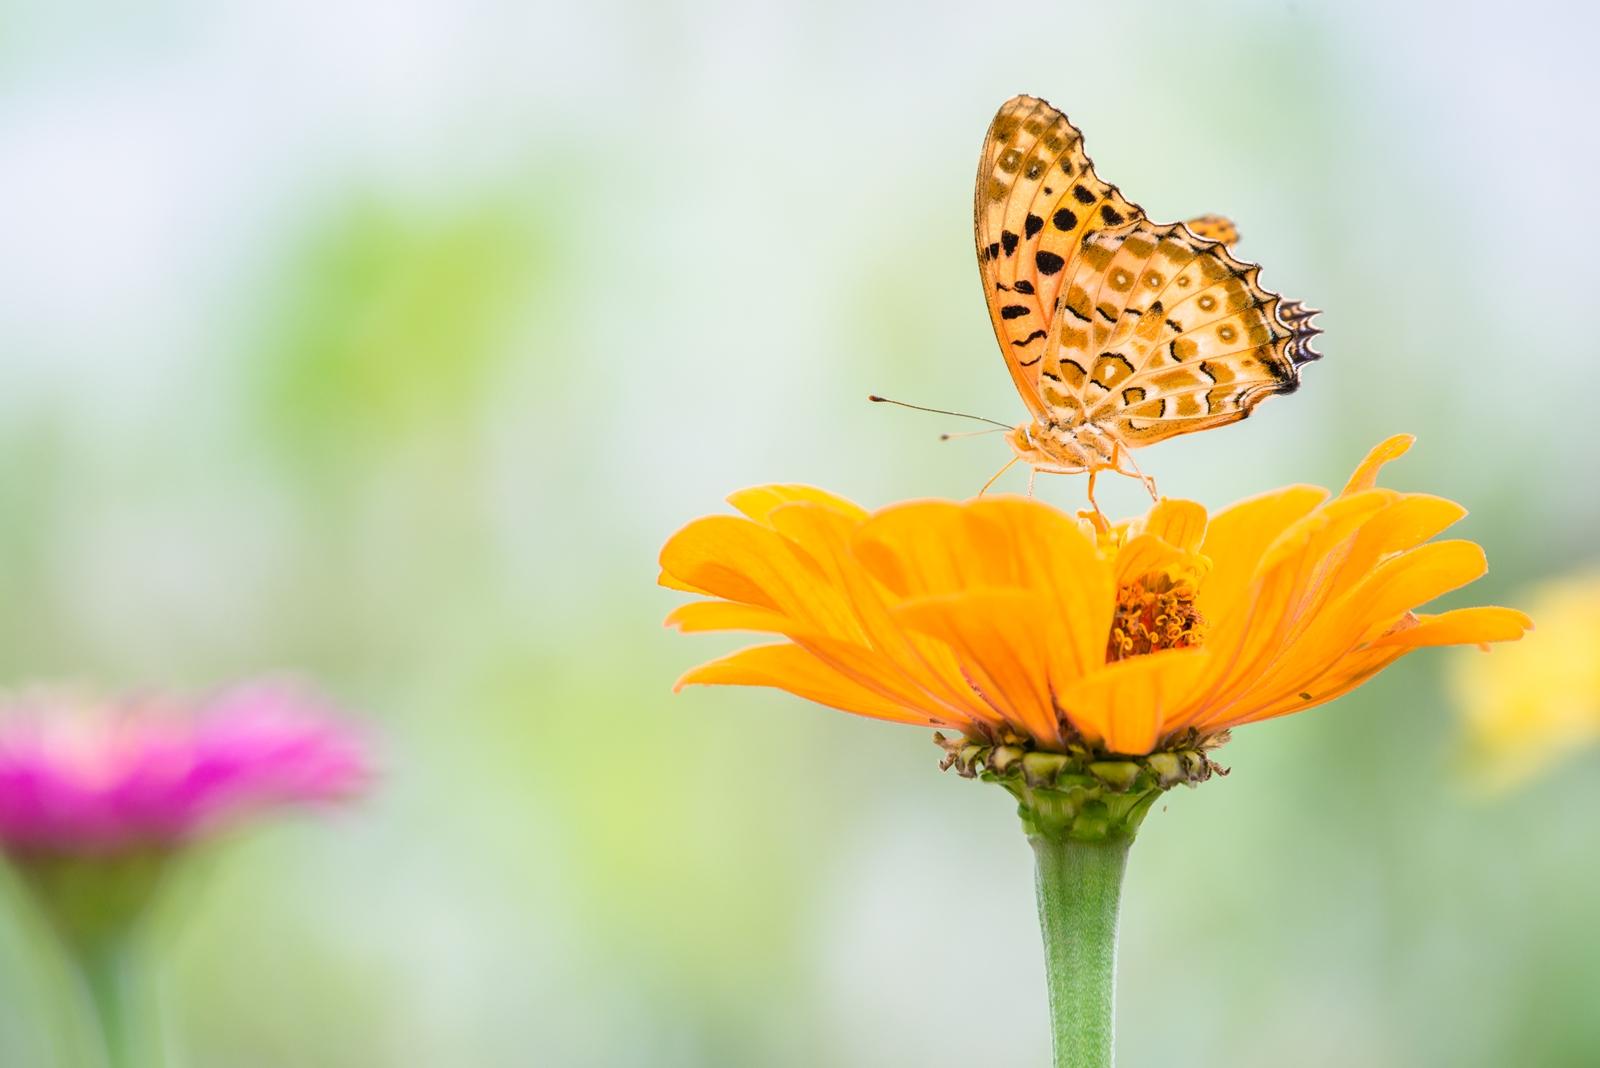 Photo: 鮮やかに咲く Blooming vividly.  夏を越える鮮やかな色 強く美しく その時を刻み残すように 色濃く咲かせて  fritillary. (ヒョウモンチョウ)  #insect #cooljapan #nikon #sigma  Nikon D800E SIGMA 150-600mm F5-6.3 DG OS HSM Contemporary